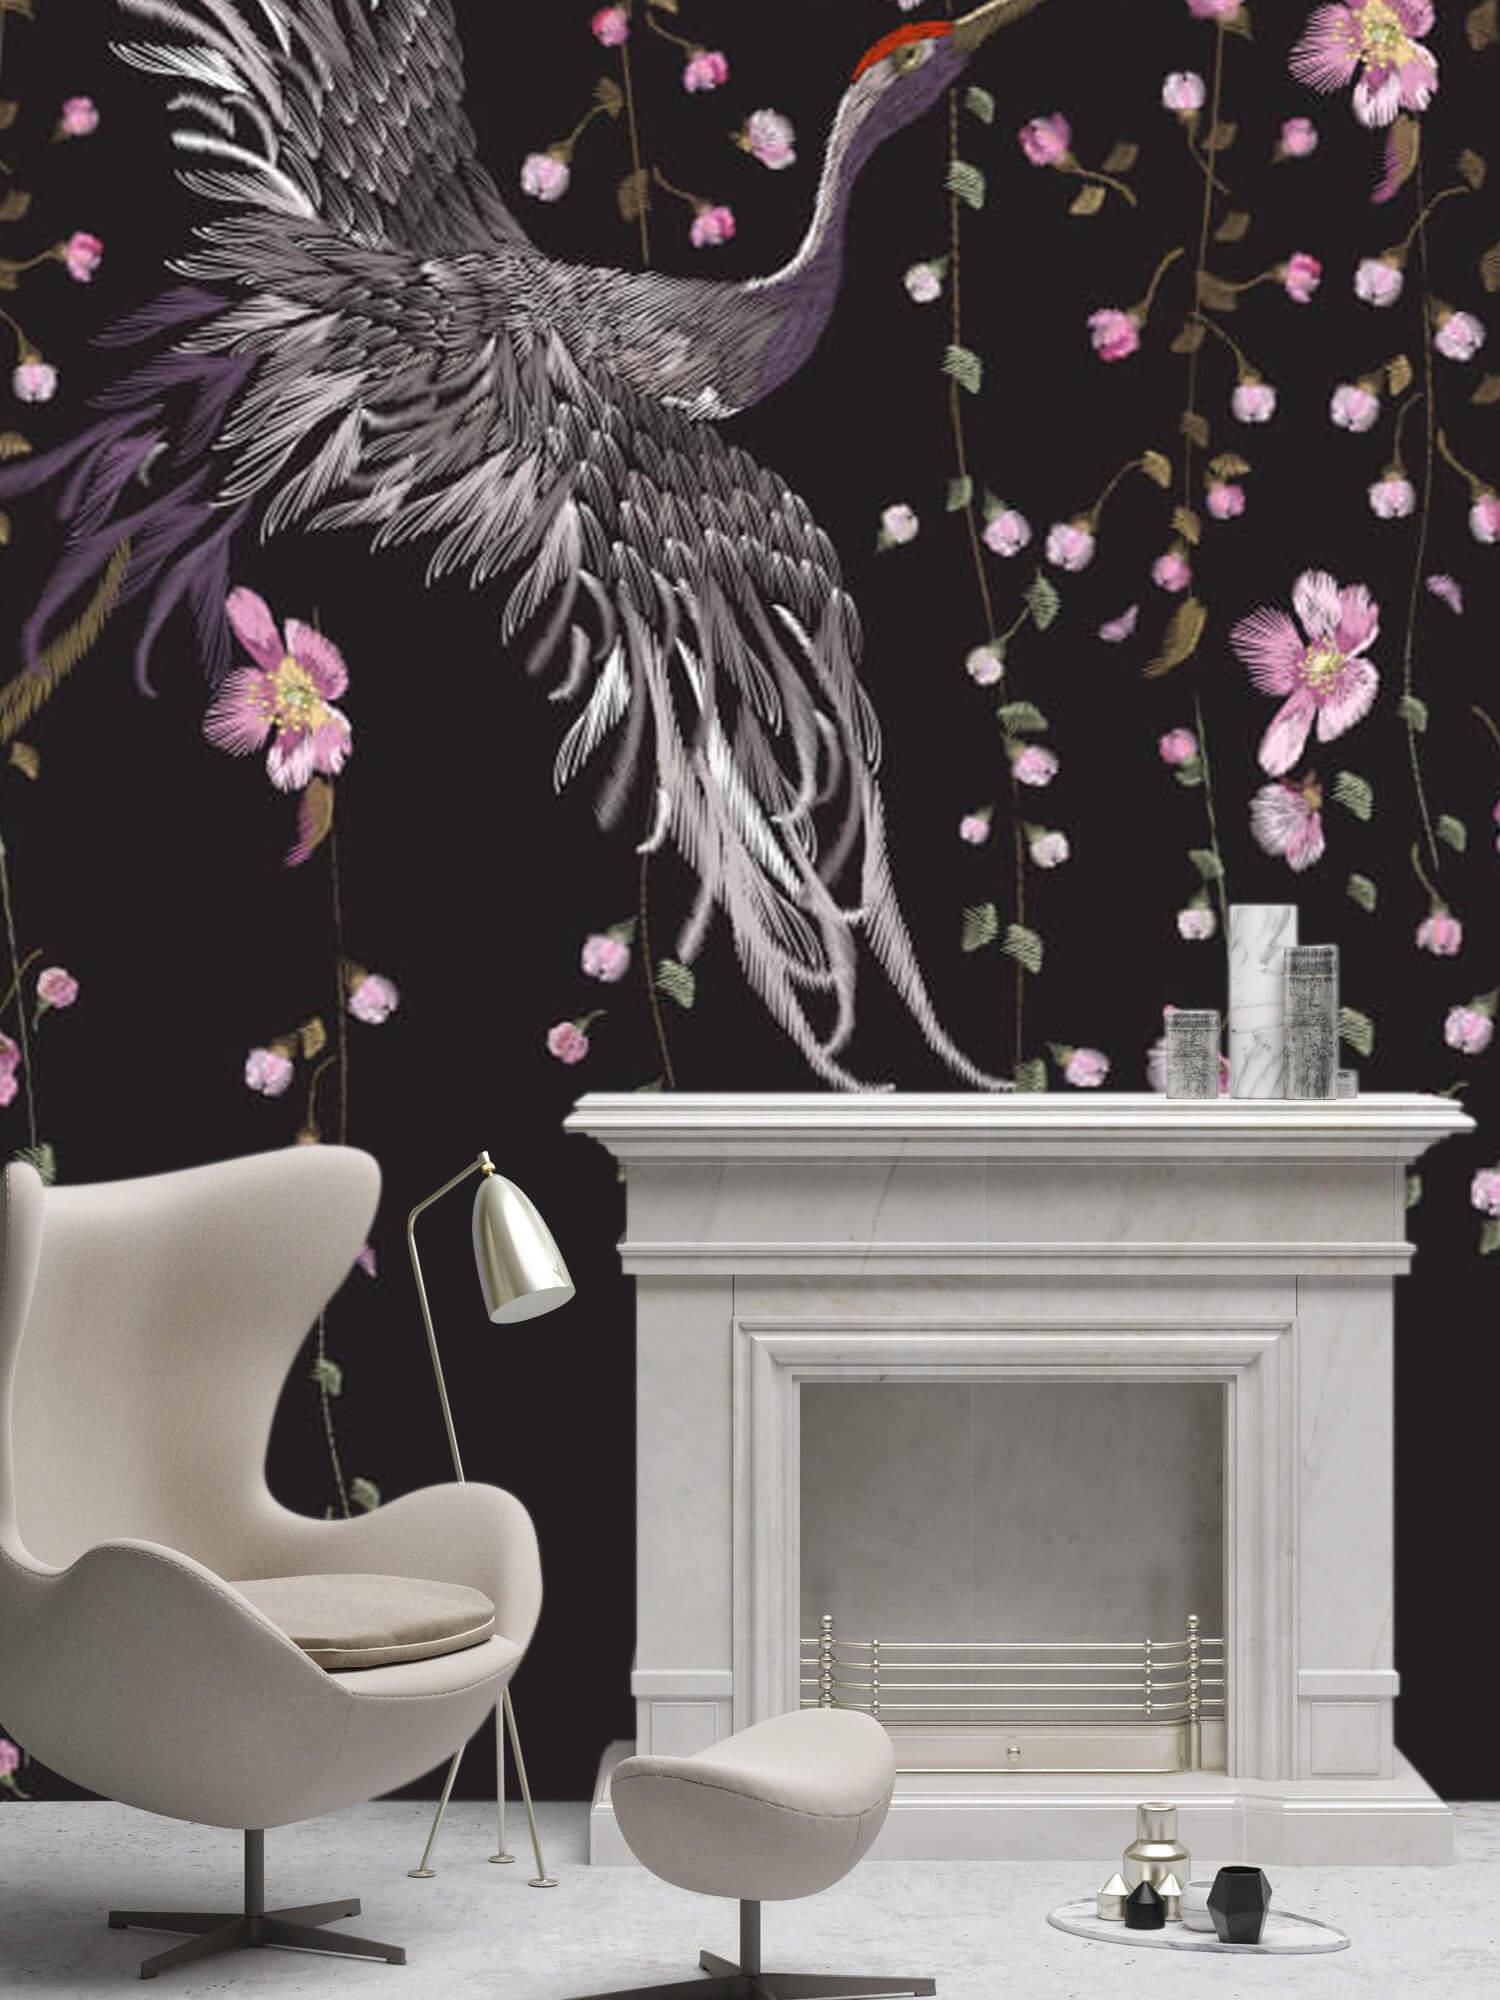 pattern Kraanvogel bij roze bloemen 2